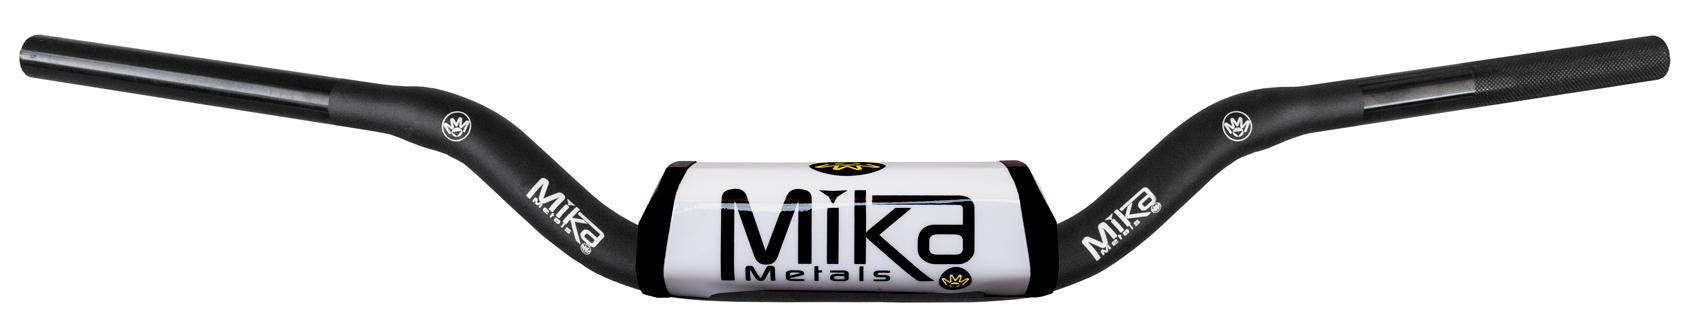 MIKA Metals テーパーハンドルバー RAW シリーズ